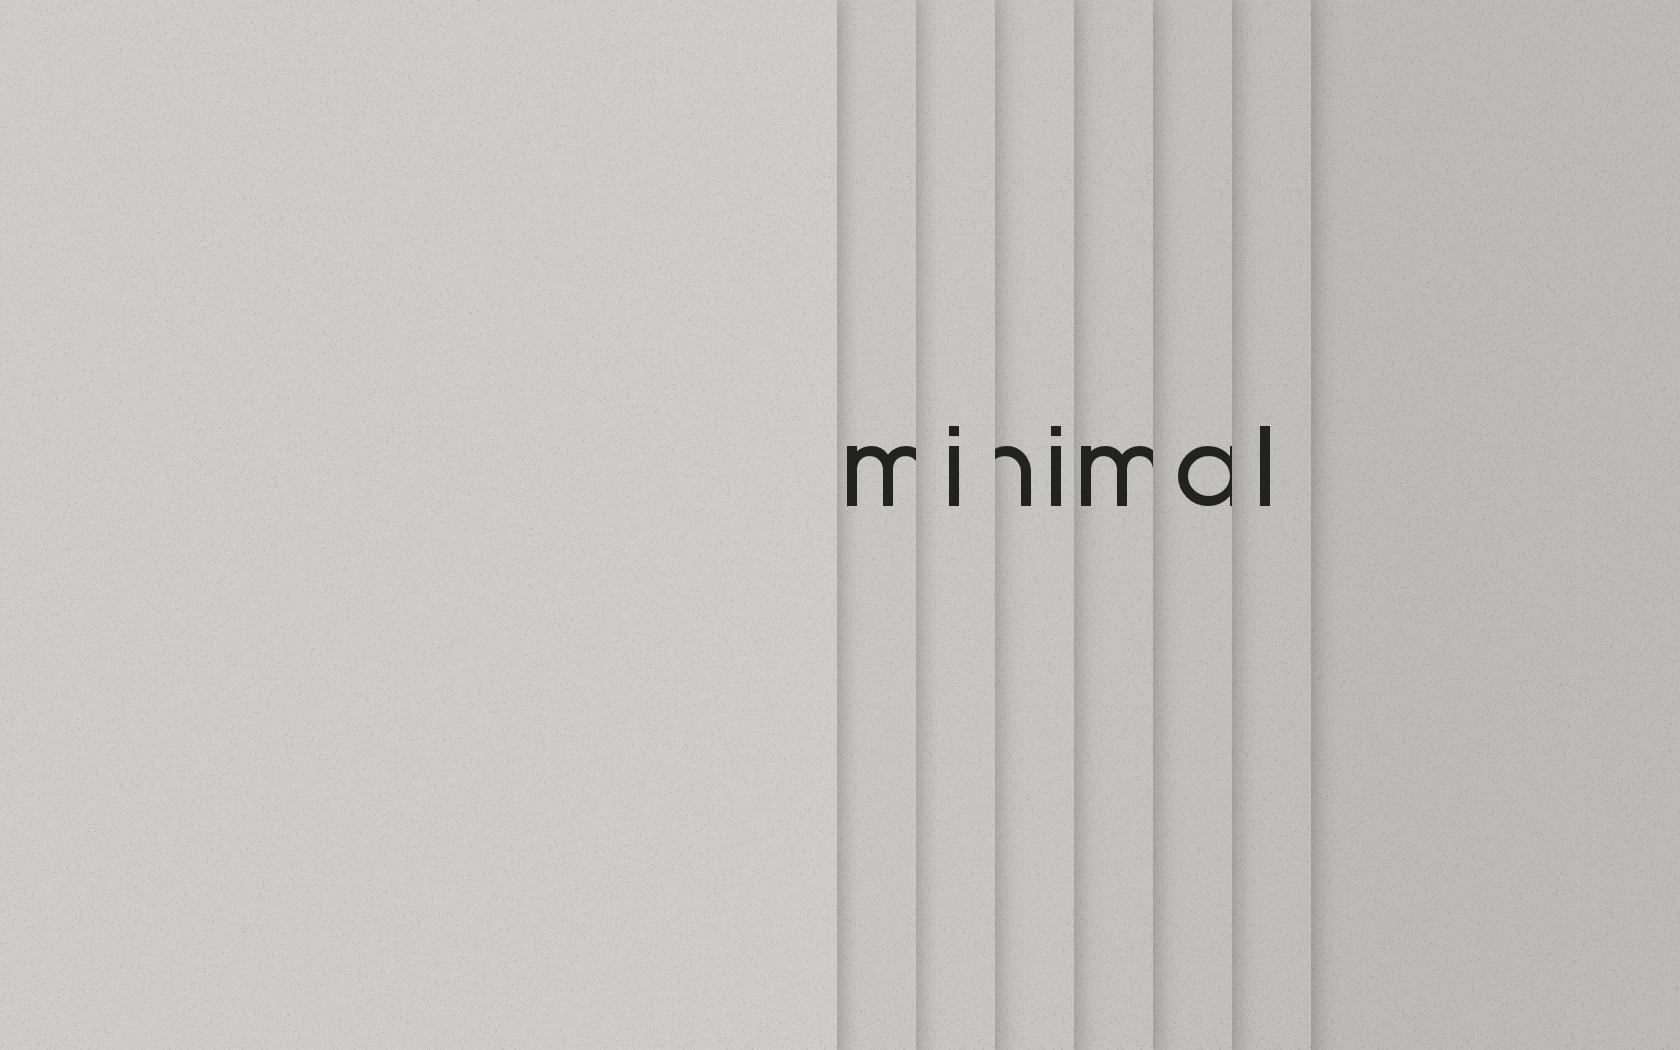 Minimal wallpaper by coroners on deviantart for Minimalist design definition